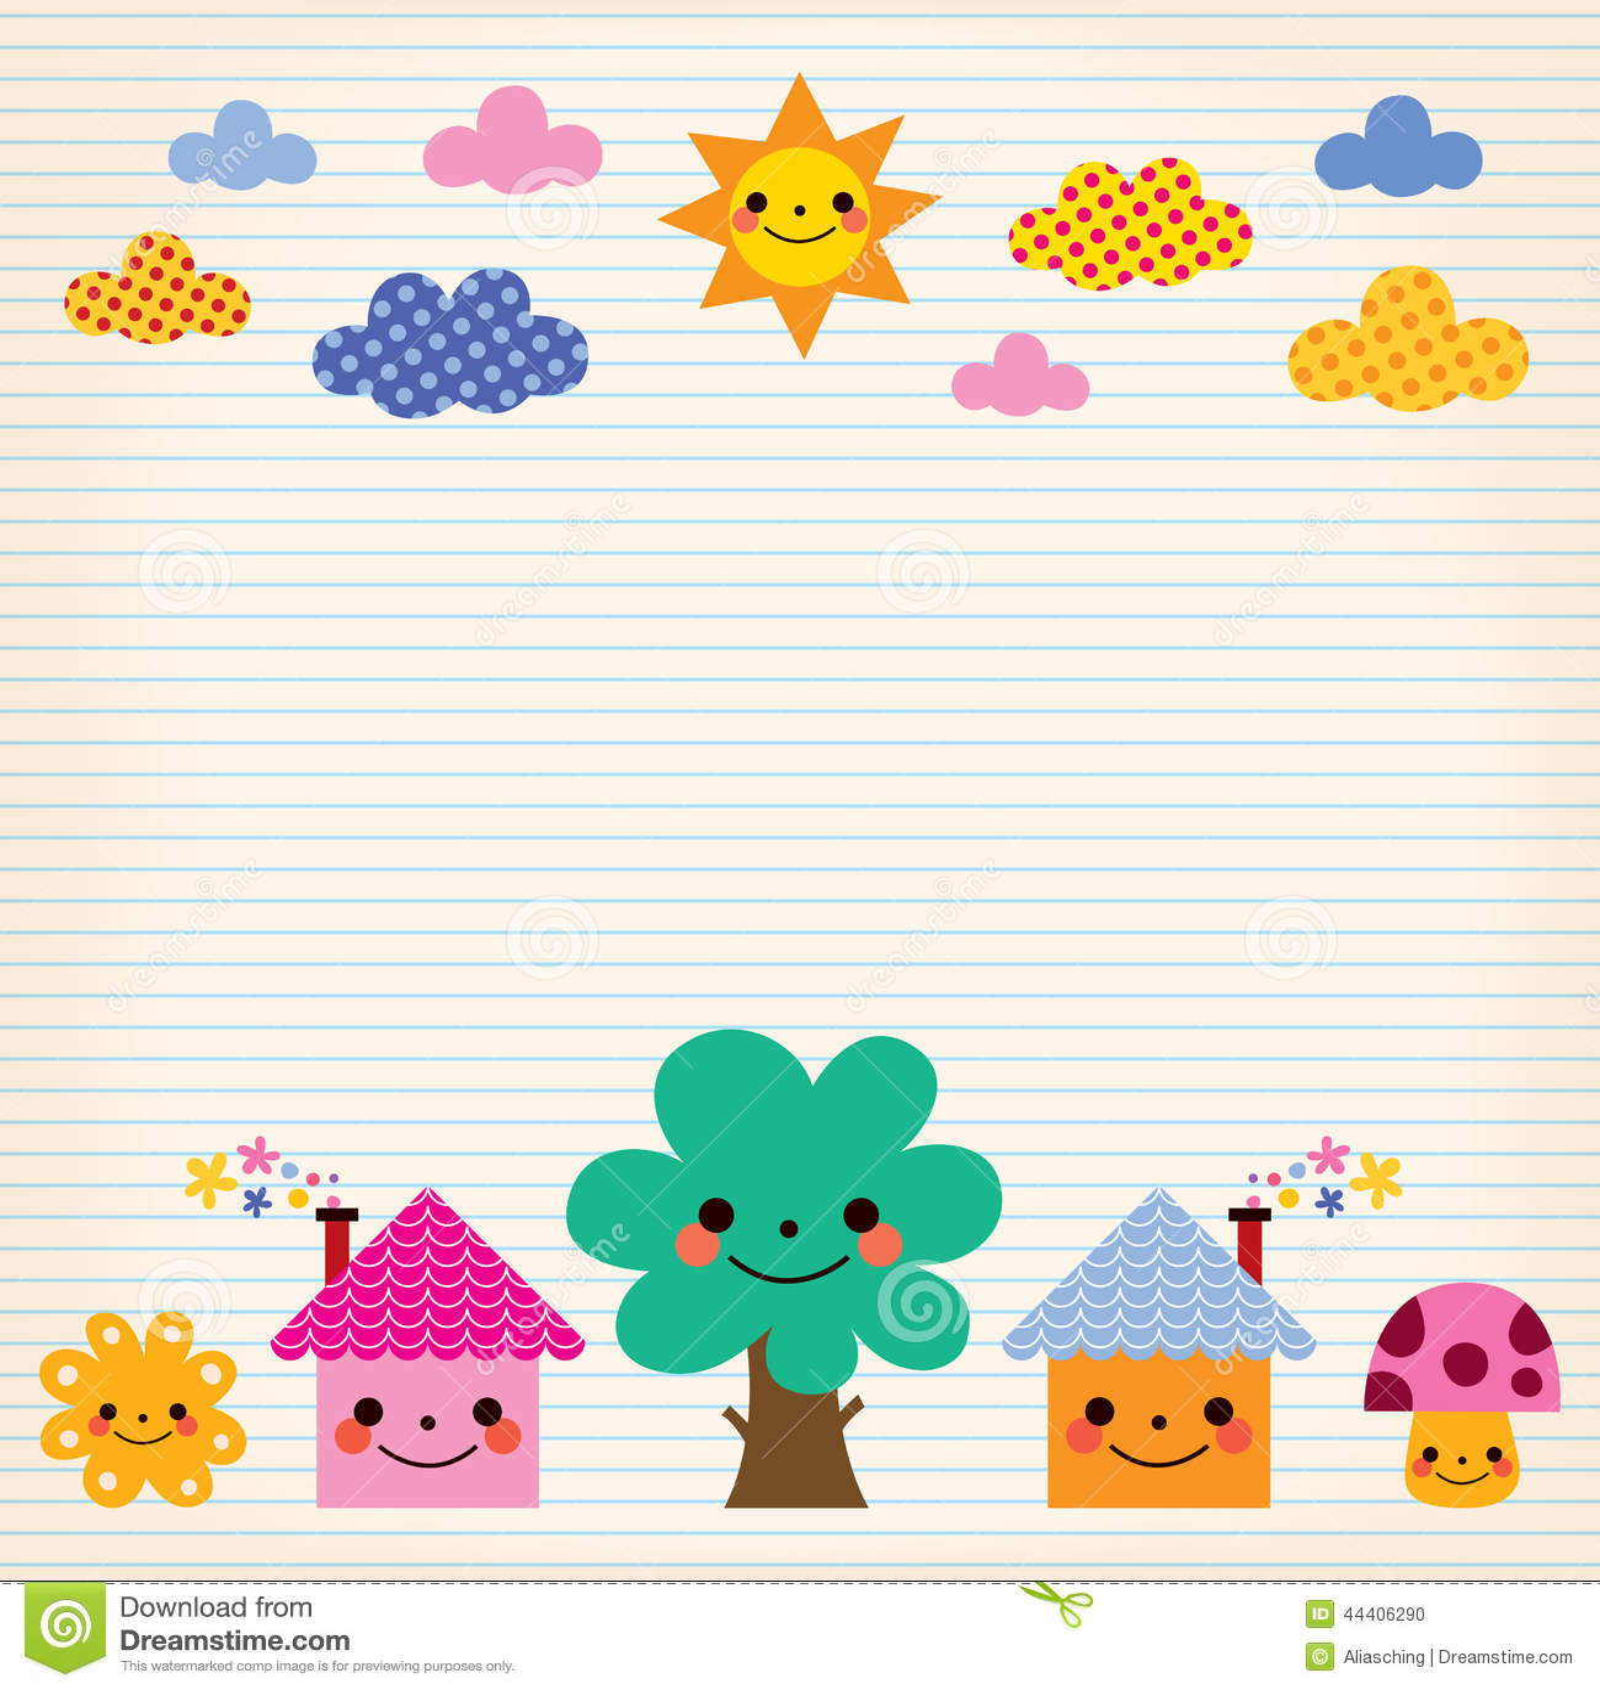 Cute Kid Wallpapers Free Download Cute Houses Tree Sun Mushroom Clouds Kids Lined Paper